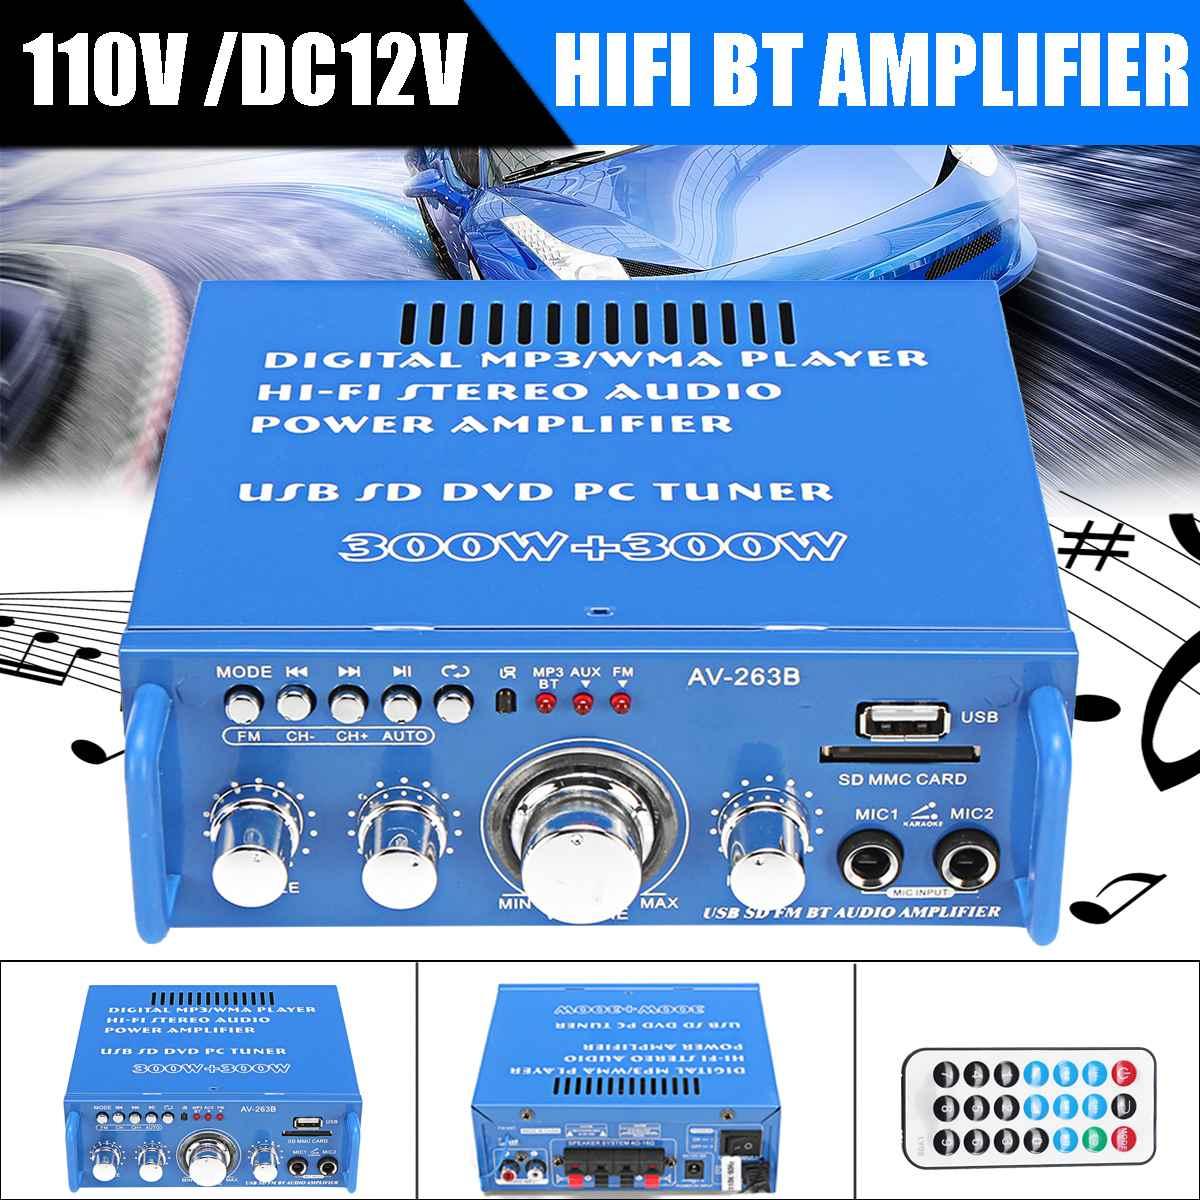 300W+300W 110V/12V Home Audio Power Amplifier HIFI Stereo 2 CH Digital Bluetooth Mini Amplificador FM MP3 Music Player